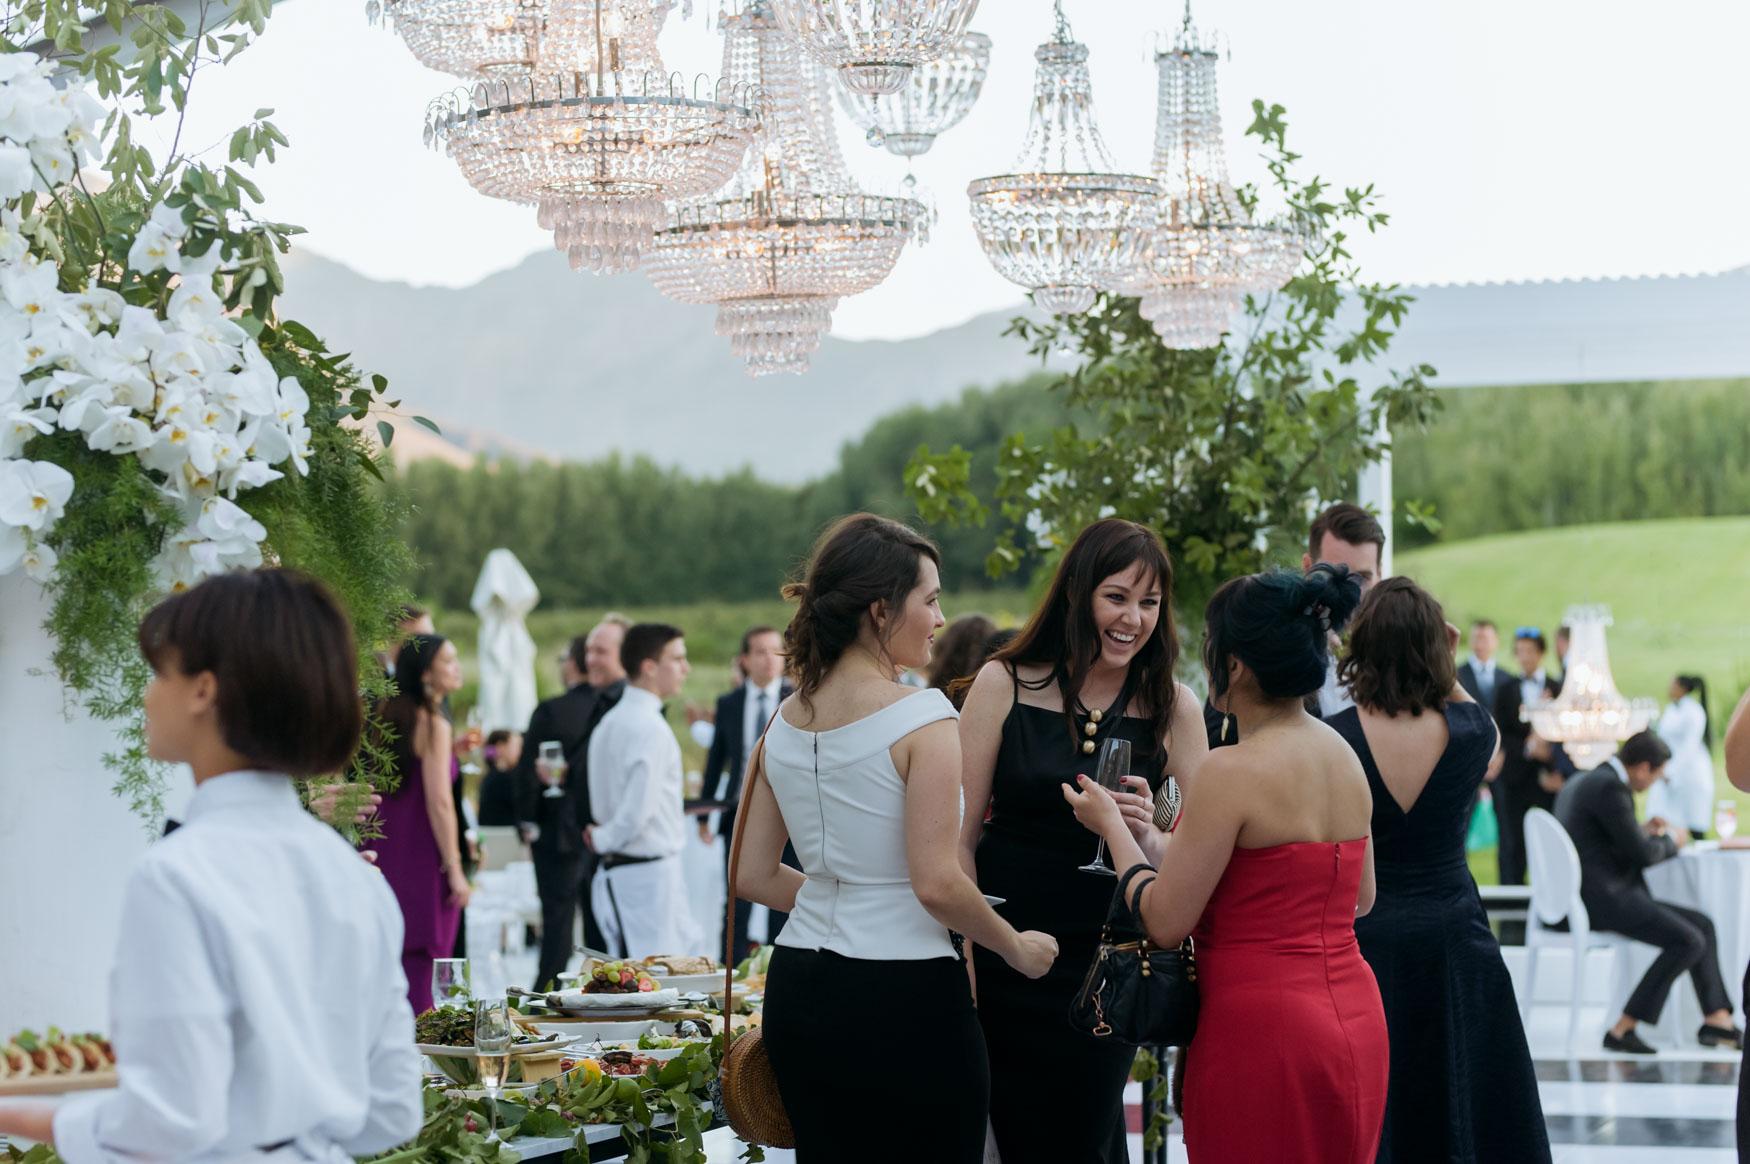 cape-town-south-africa-wedding-photographer-john-henry-photo-pre-drinks-001-23.JPG